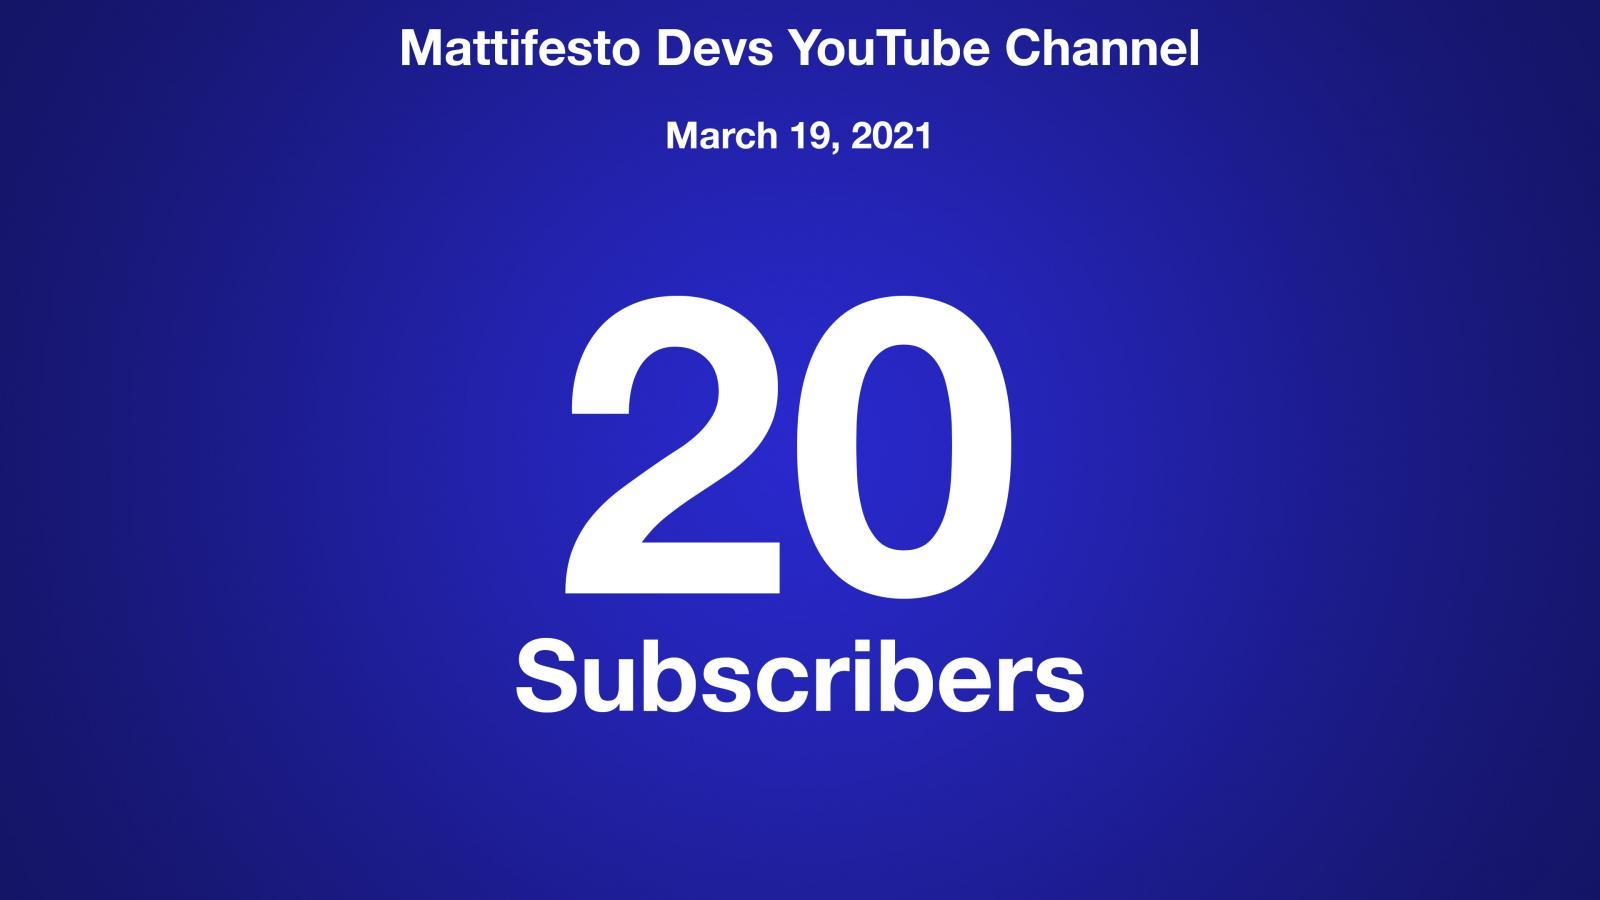 Mattifesto Devs YouTube Channel, March 19 2021, 20 Subscribers